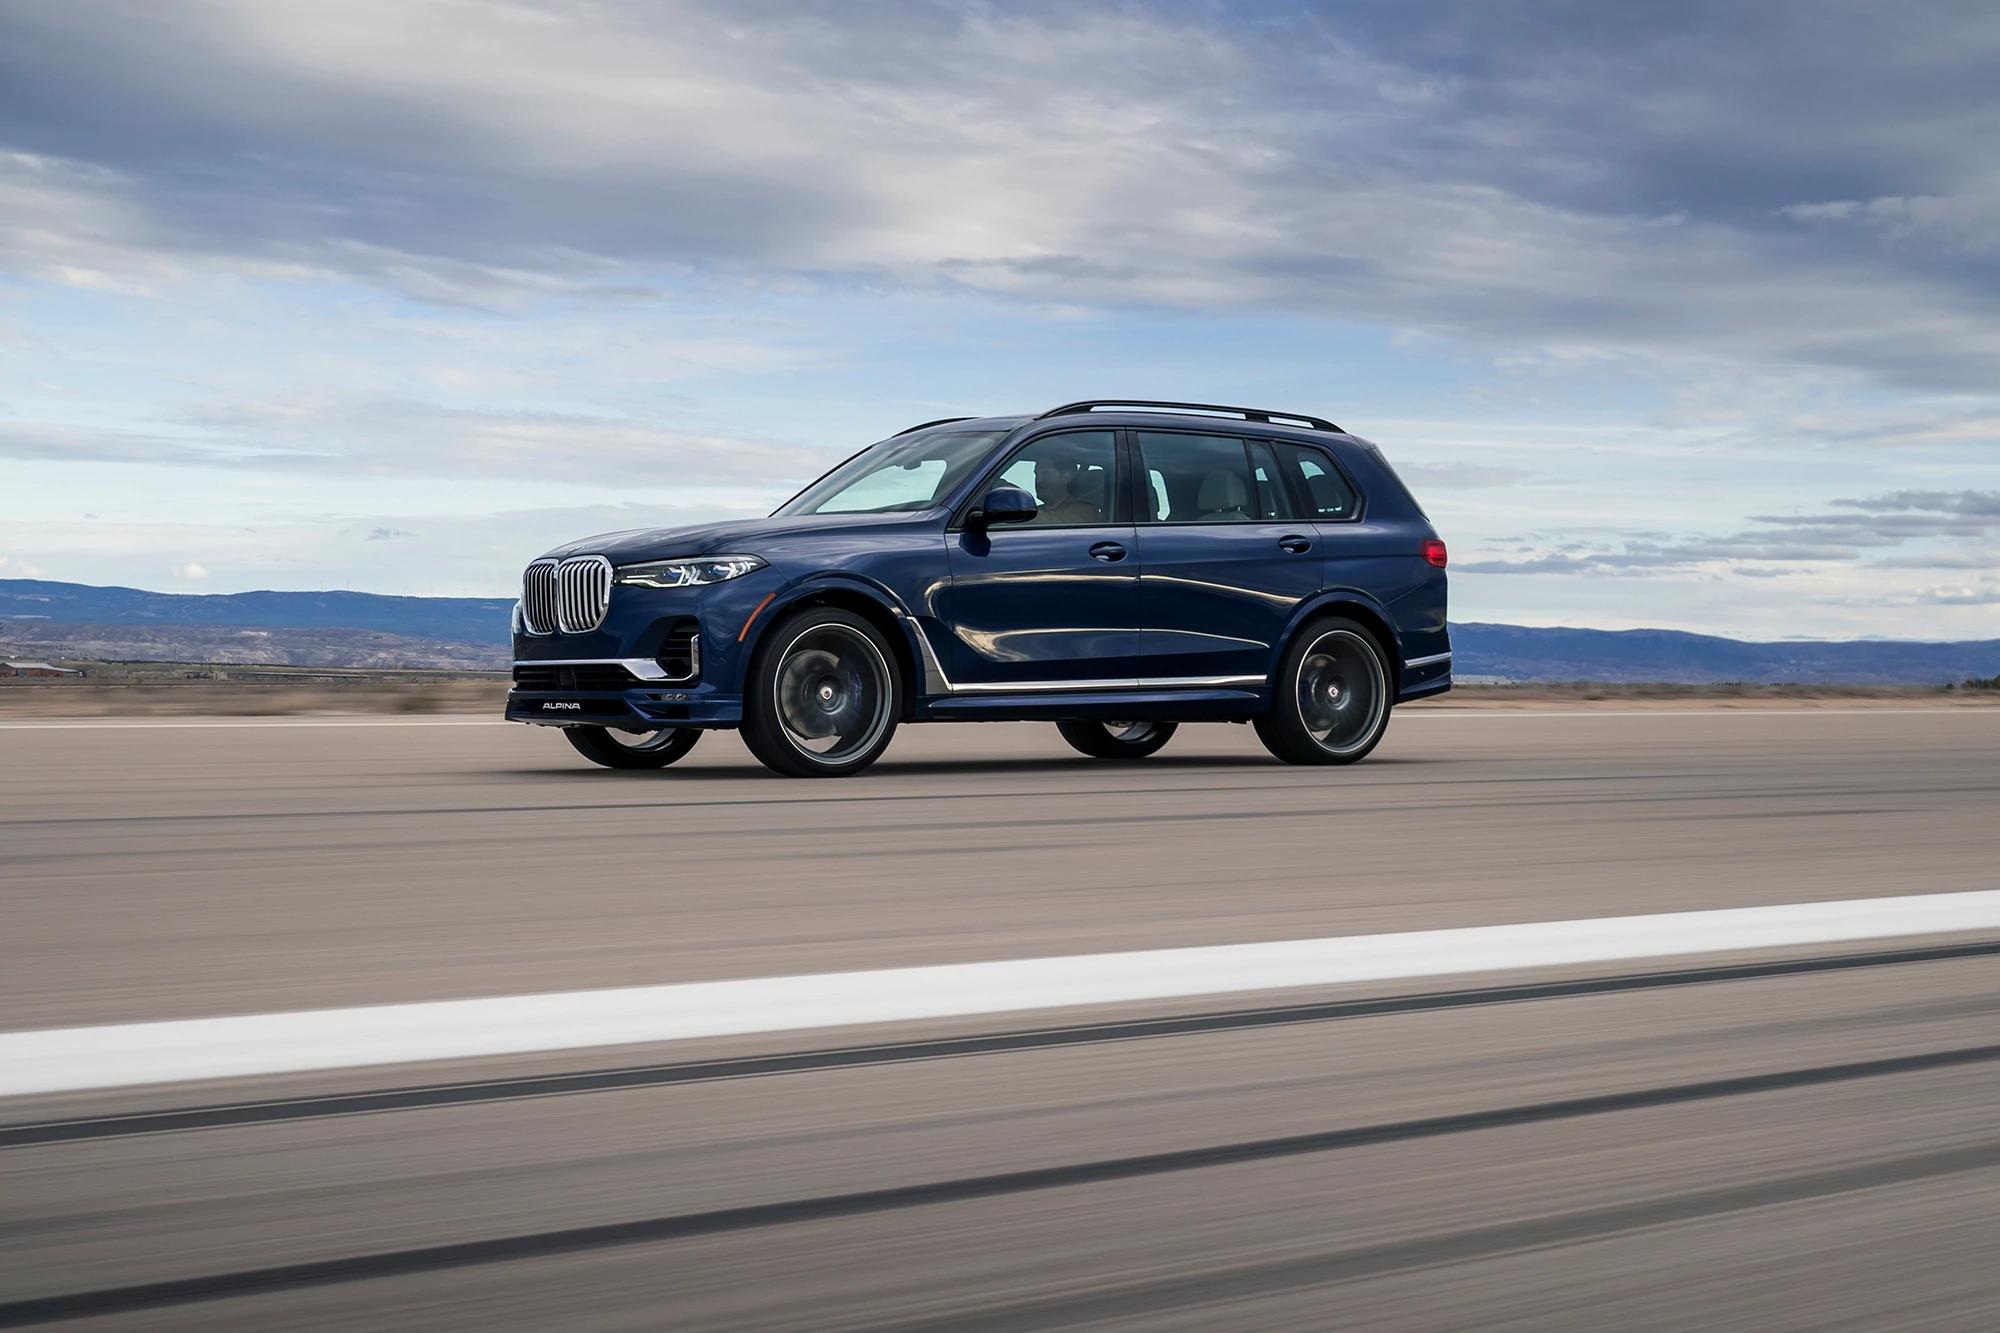 2021 BMW Alpina XB7: Big SUV, Big Performance, Big Price